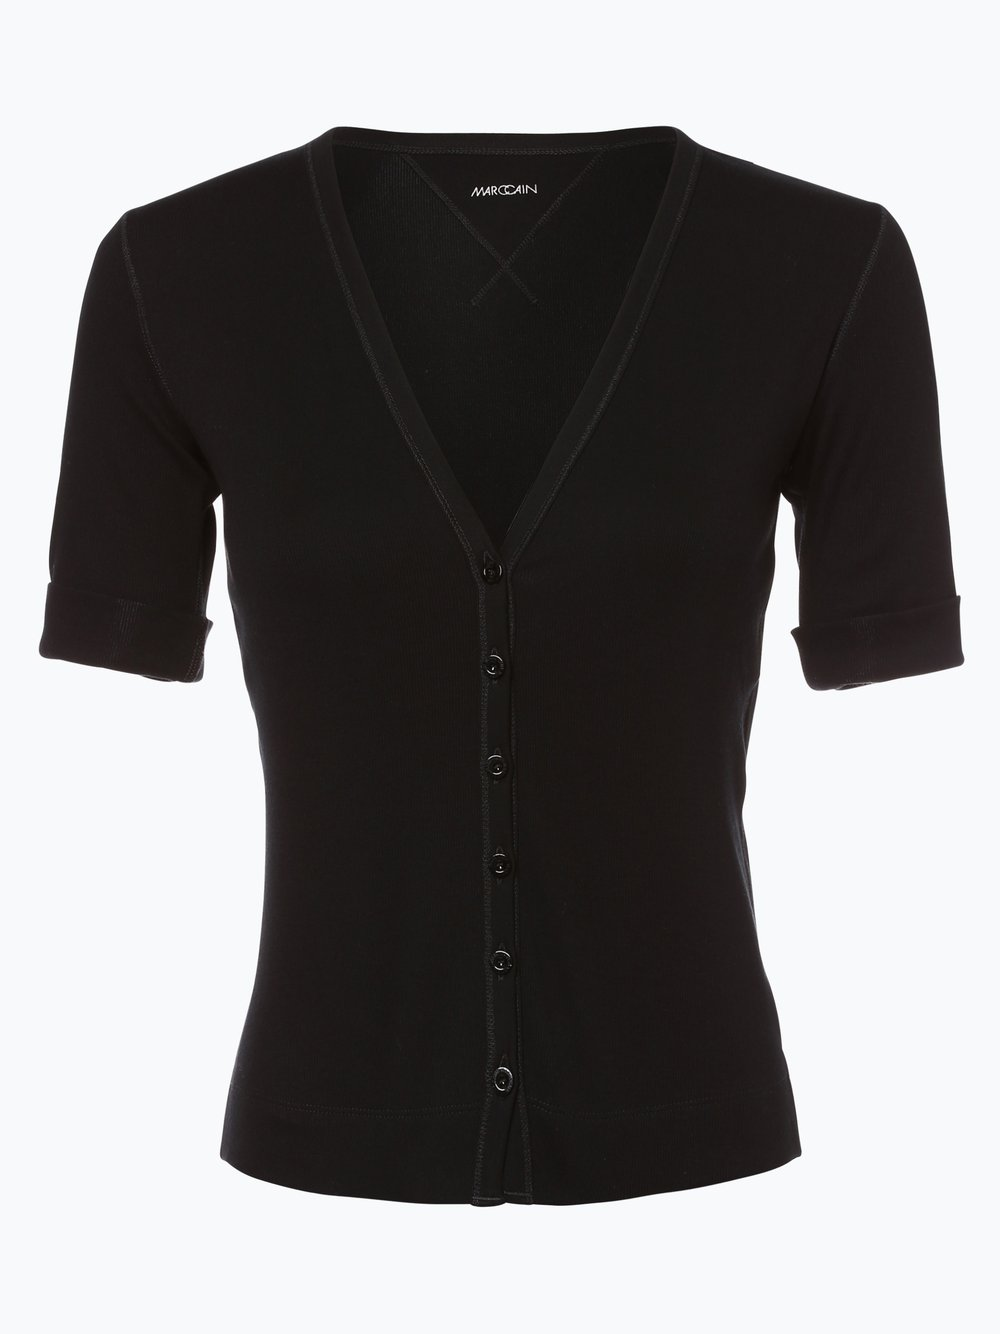 Marc Cain Essentials - Damska bluza rozpinana, czarny